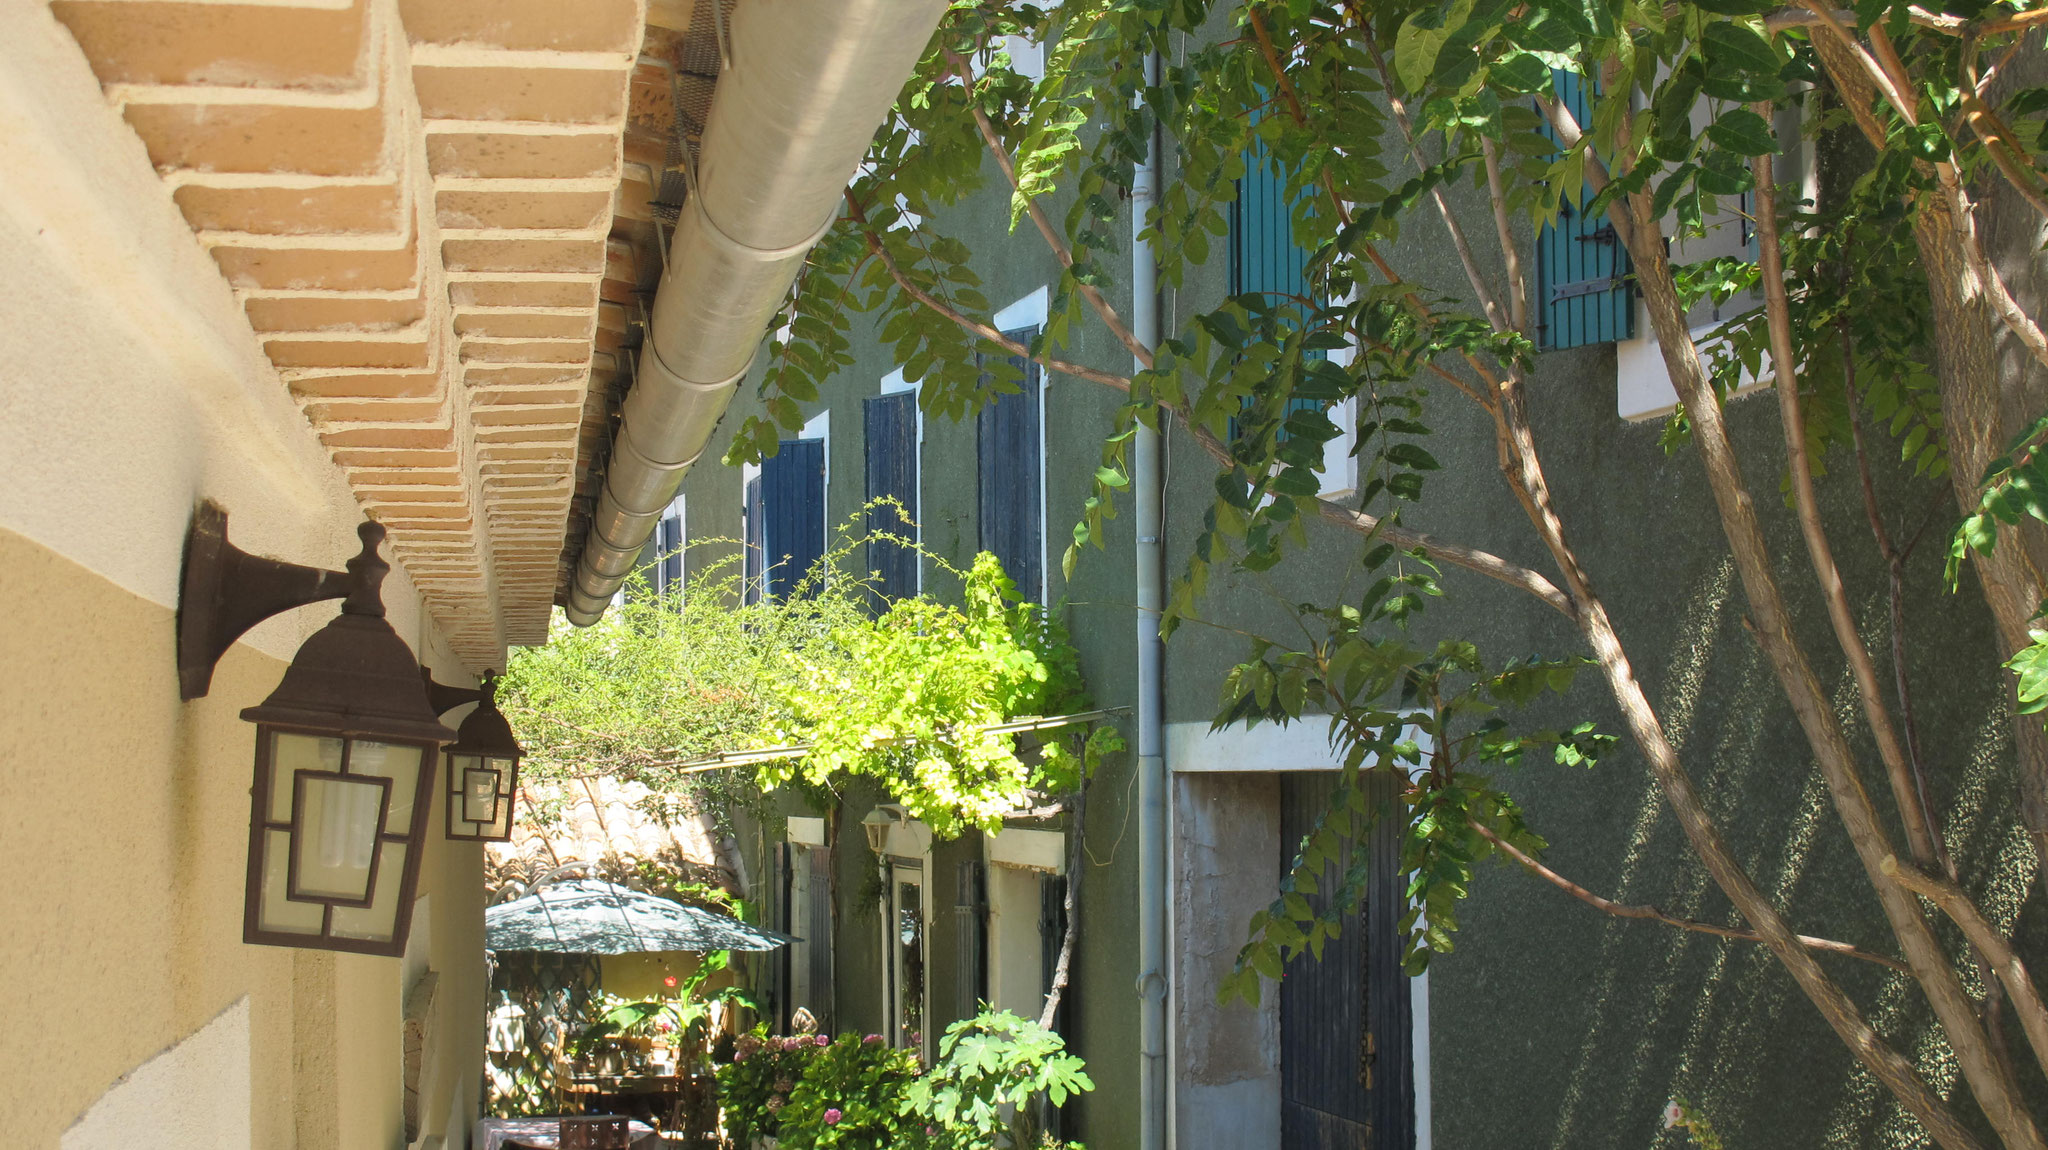 lou cardalines-chambre d'hotes-bedoin-vaucluse-provence-calme